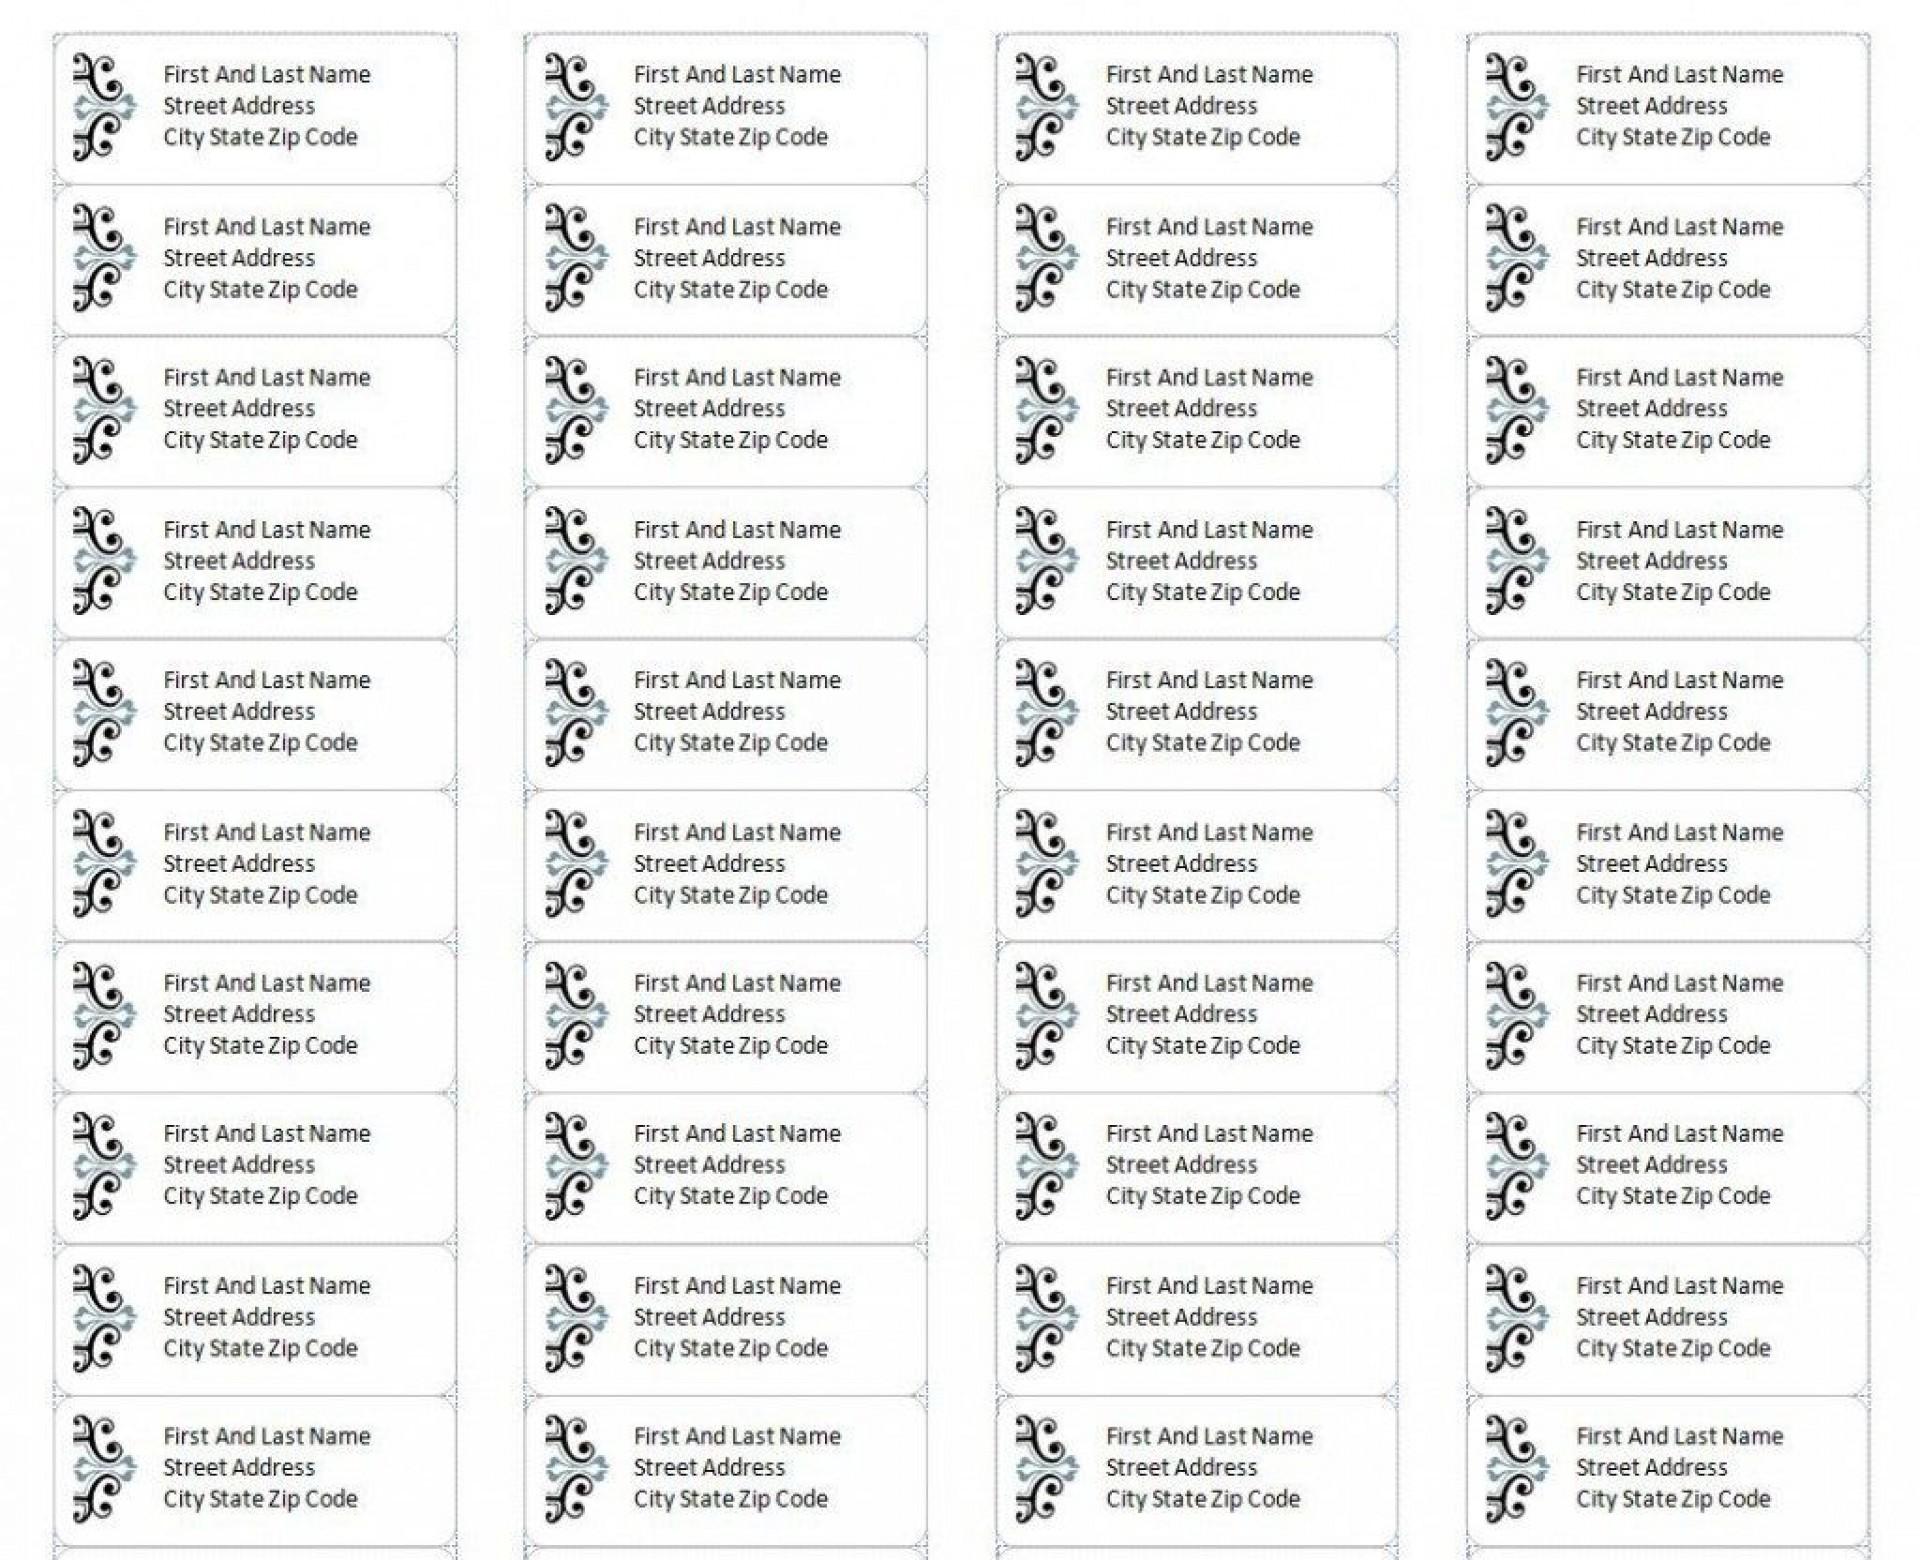 004 Impressive Microsoft Word Addres Label Template 30 Per Sheet Concept 1920